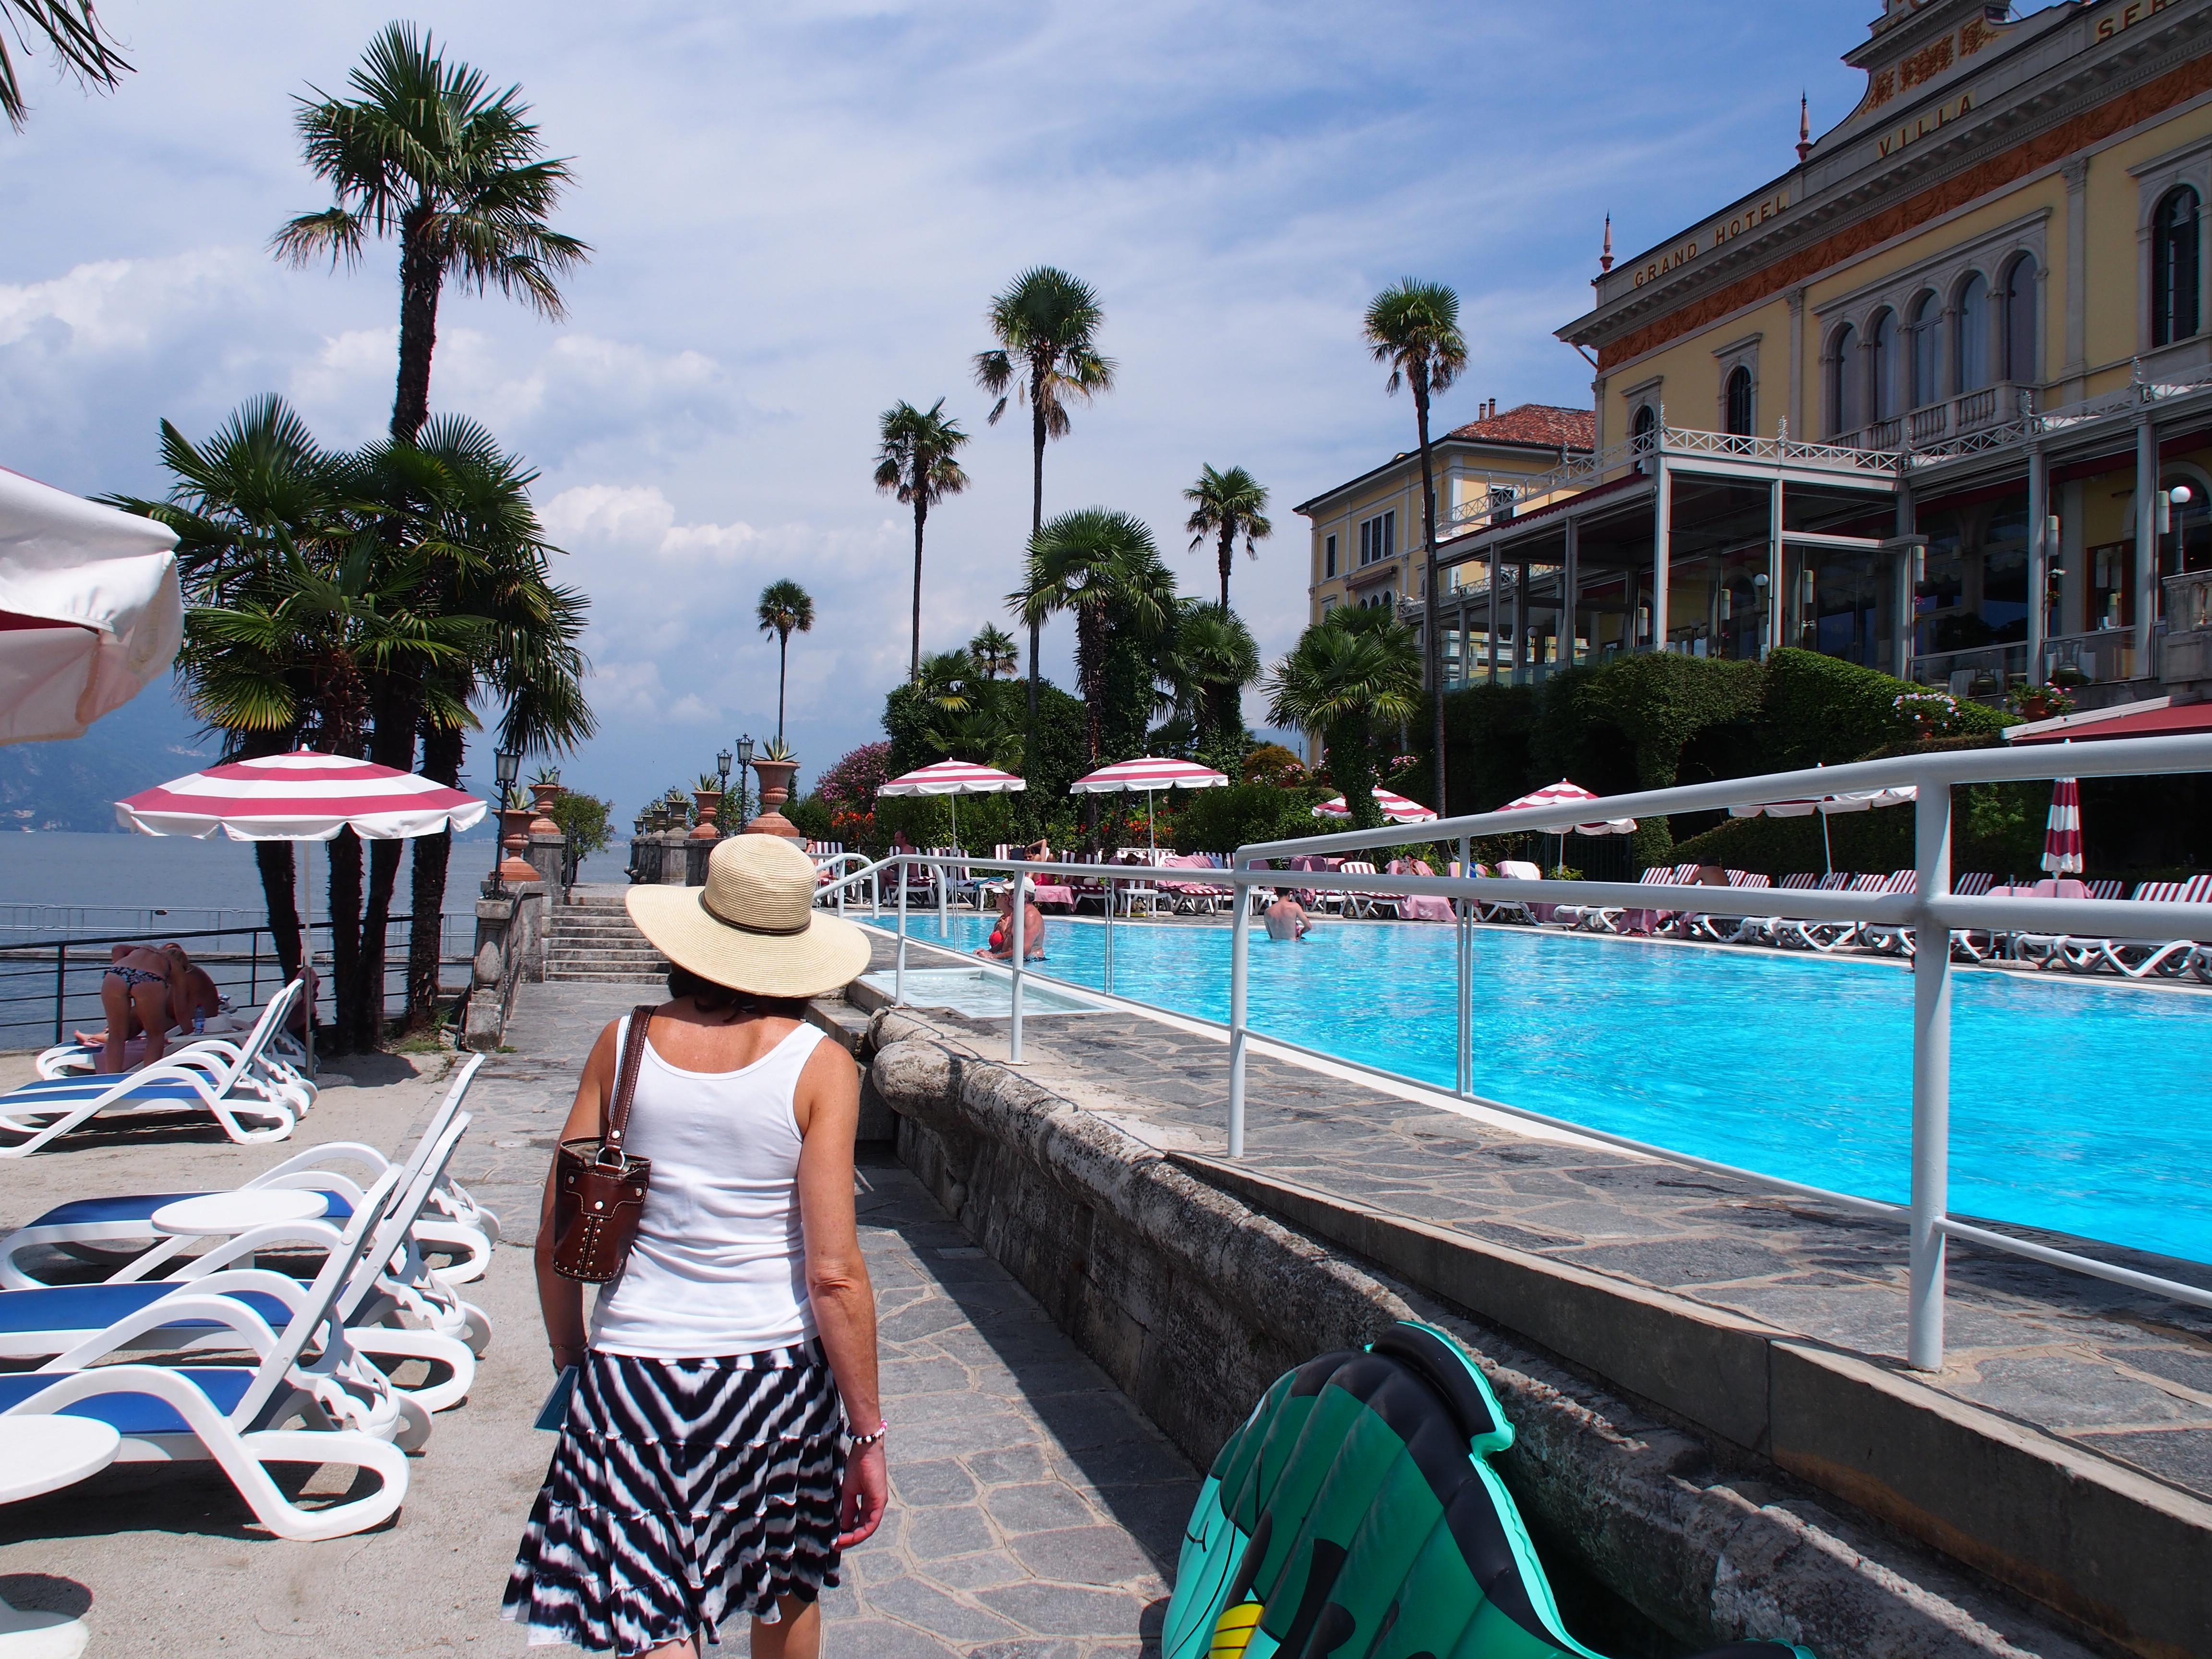 Bellagio Hotel, Lake Como